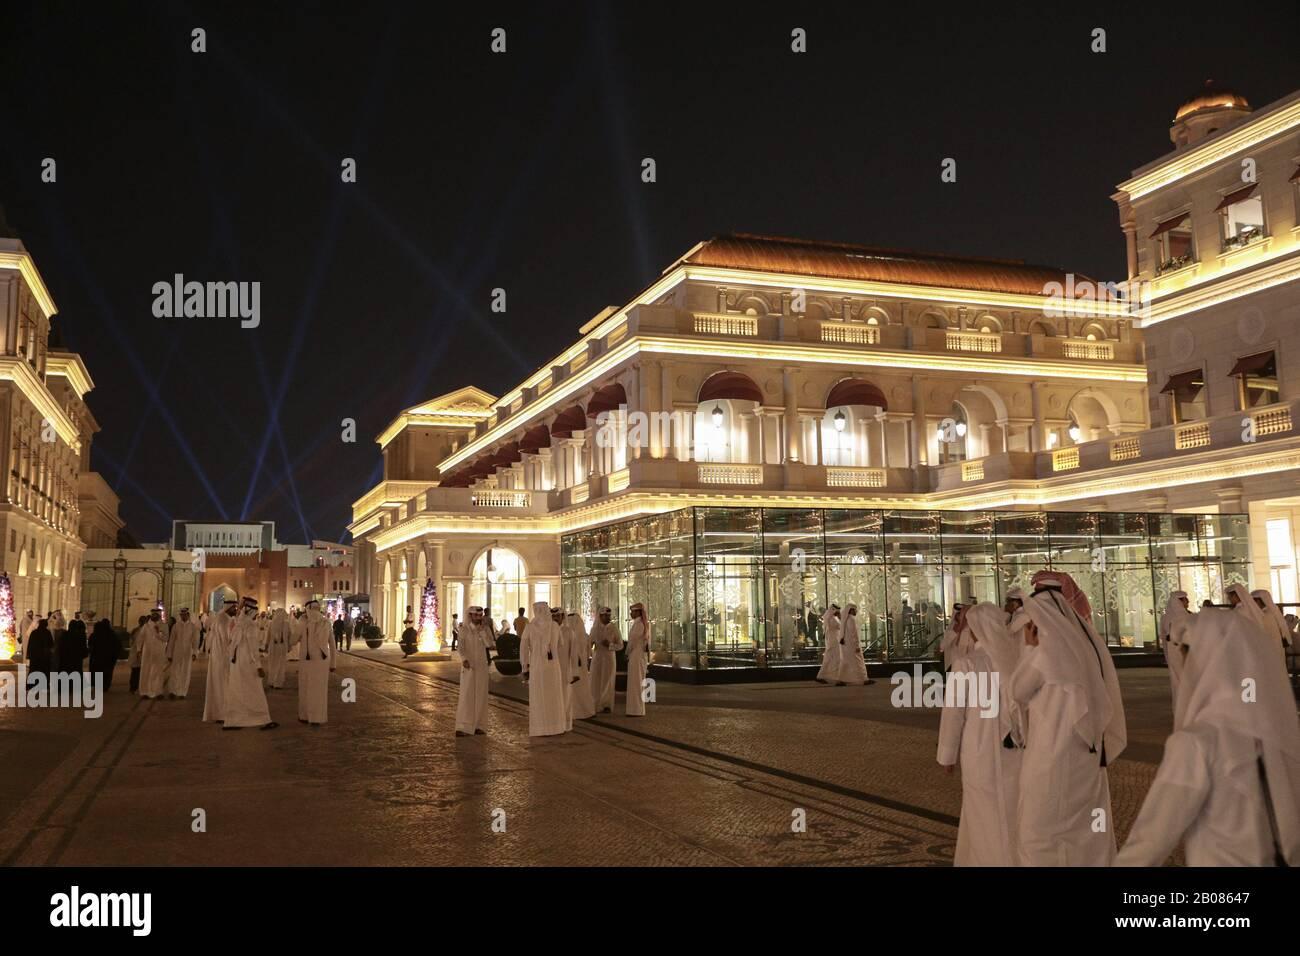 Galeries Lafayette, Doha, Qatar Il 10 Ottobre 2019 / Galeries Lafayette, Doha, Qatar Στις 10 Οκτωβρίου, 2019 Foto Stock